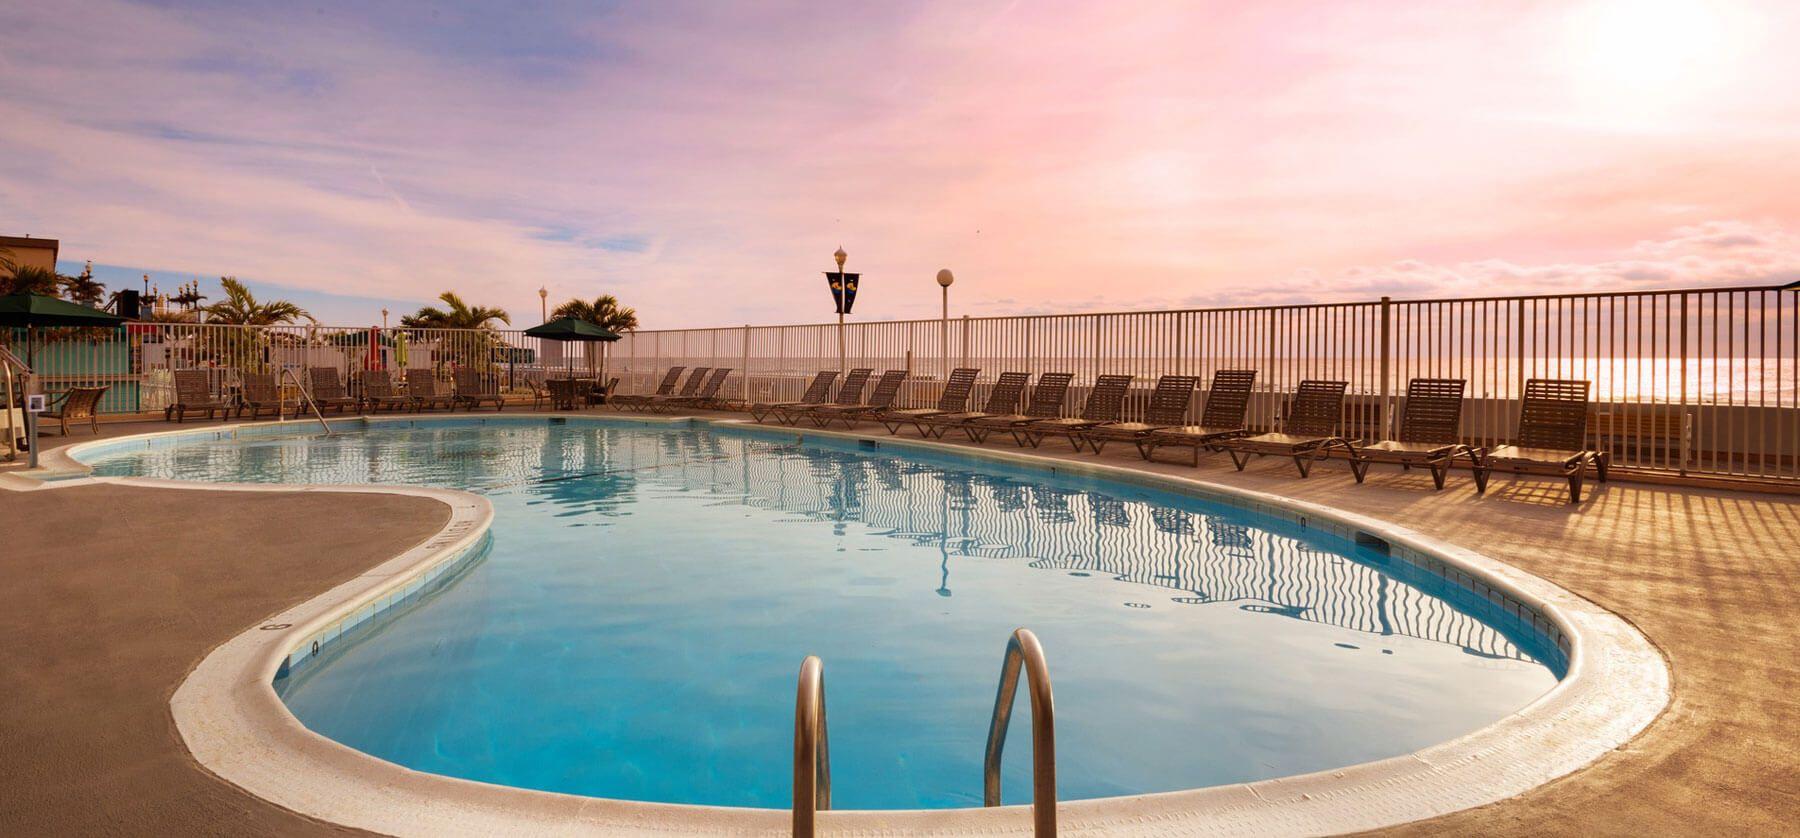 Ocean City, MD Beachfront Hotel   Quality Inn Boardwalk